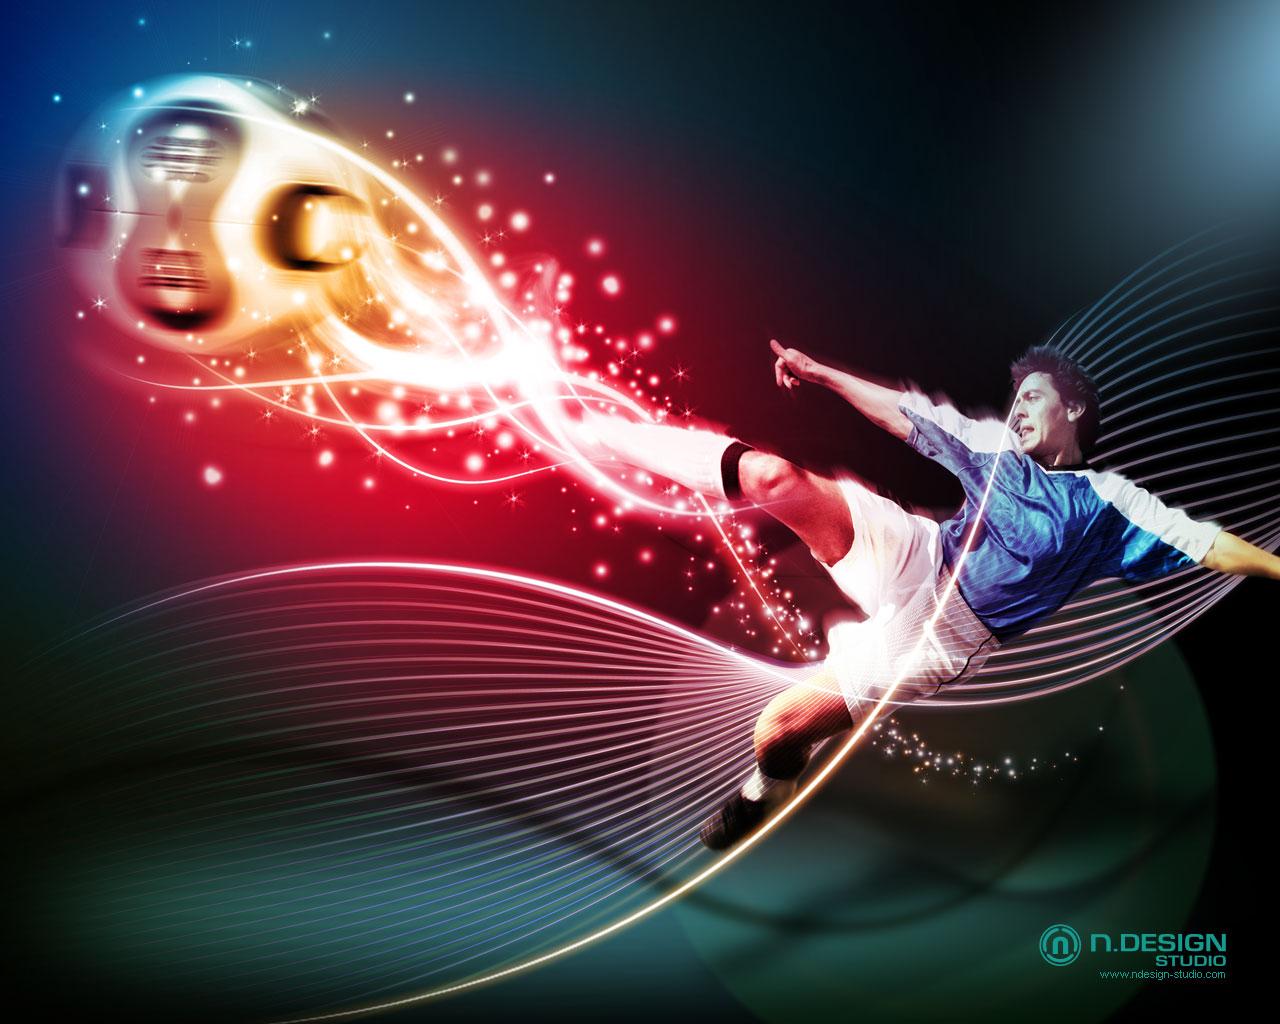 http://2.bp.blogspot.com/-CGcJflVjjW4/TZhNERzbqQI/AAAAAAAABKg/XYNVrNQEAQE/s1600/football_player.jpg